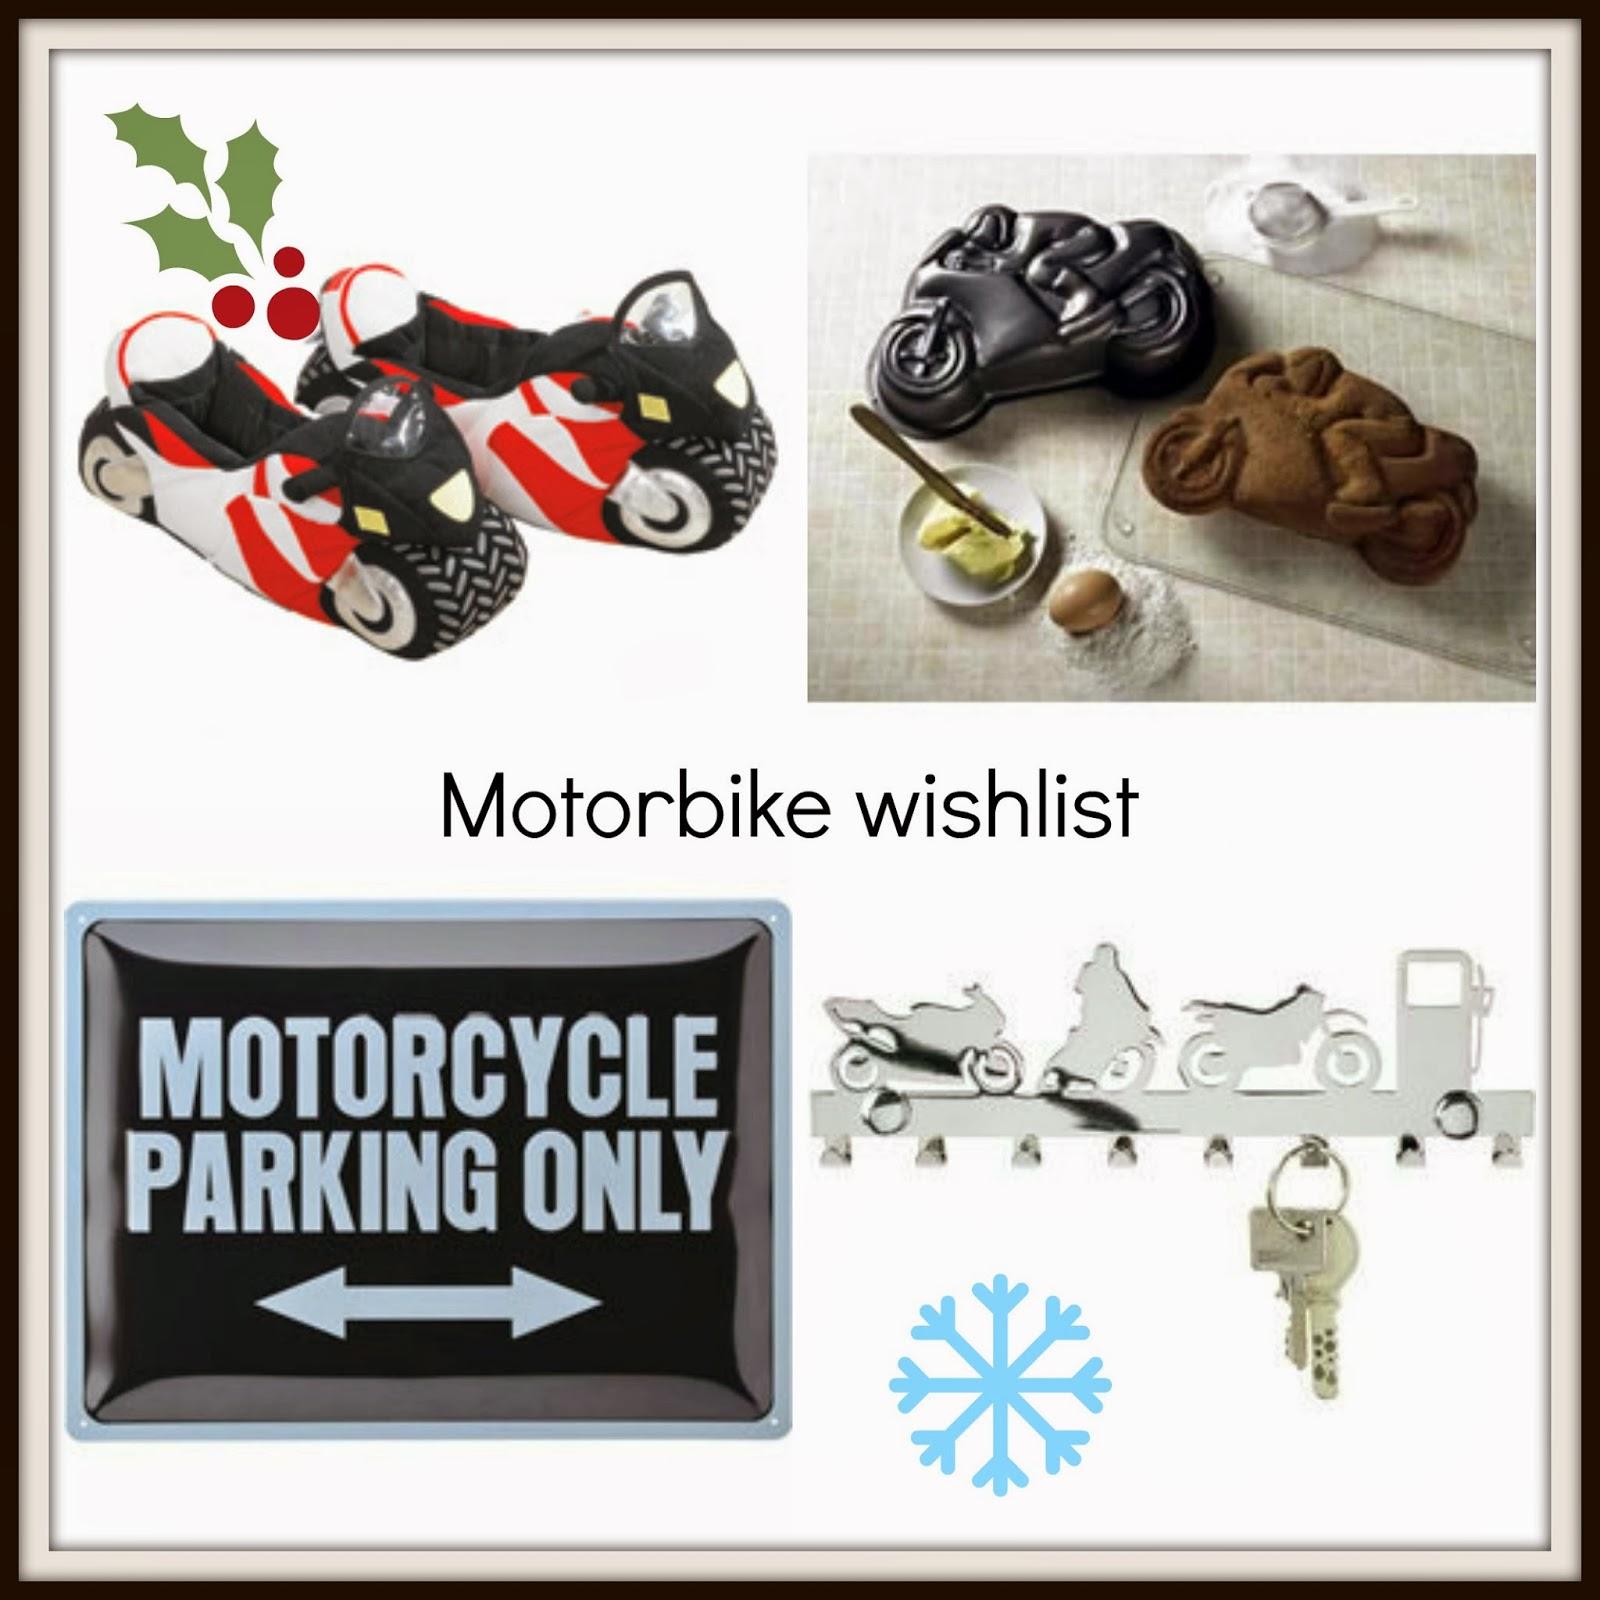 at number 18: Motorbike gift wishlist